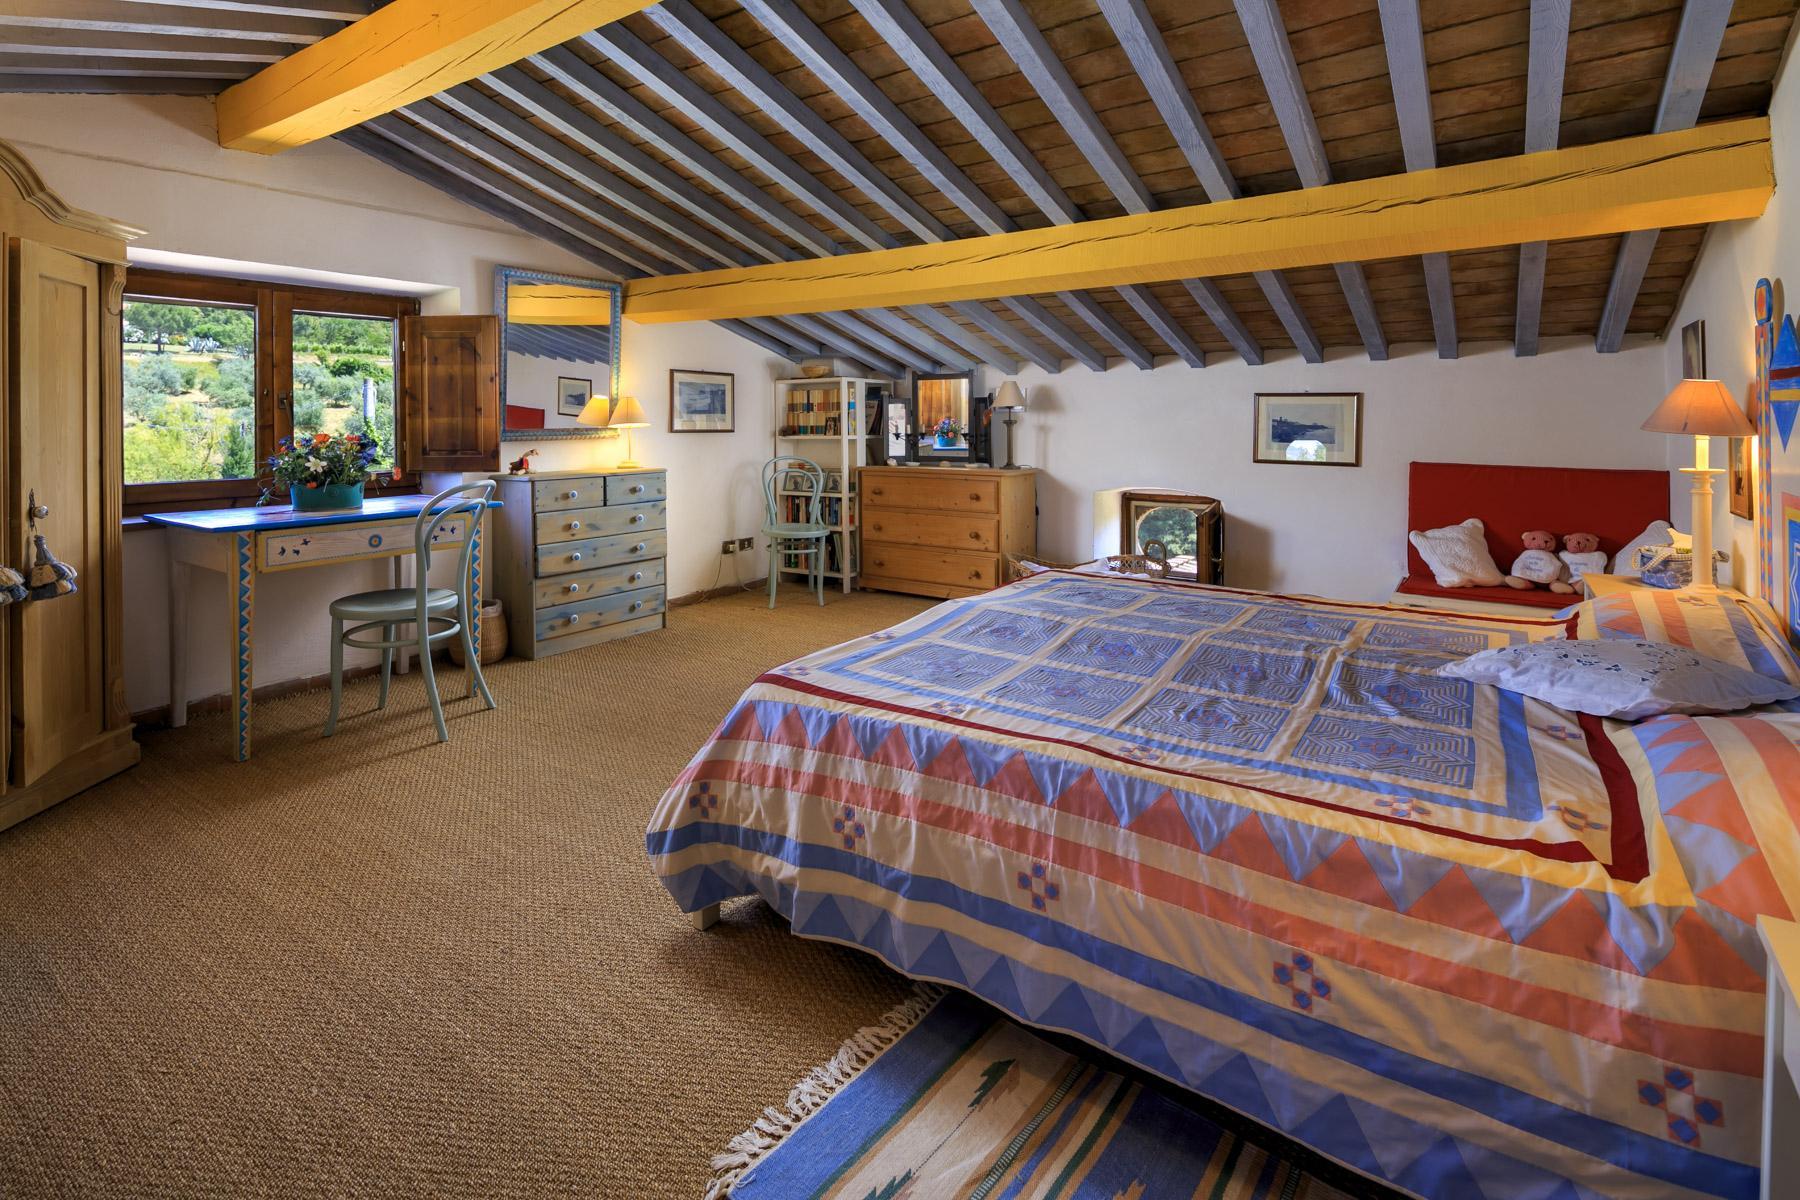 Belle villa toscane avec piscine - 24